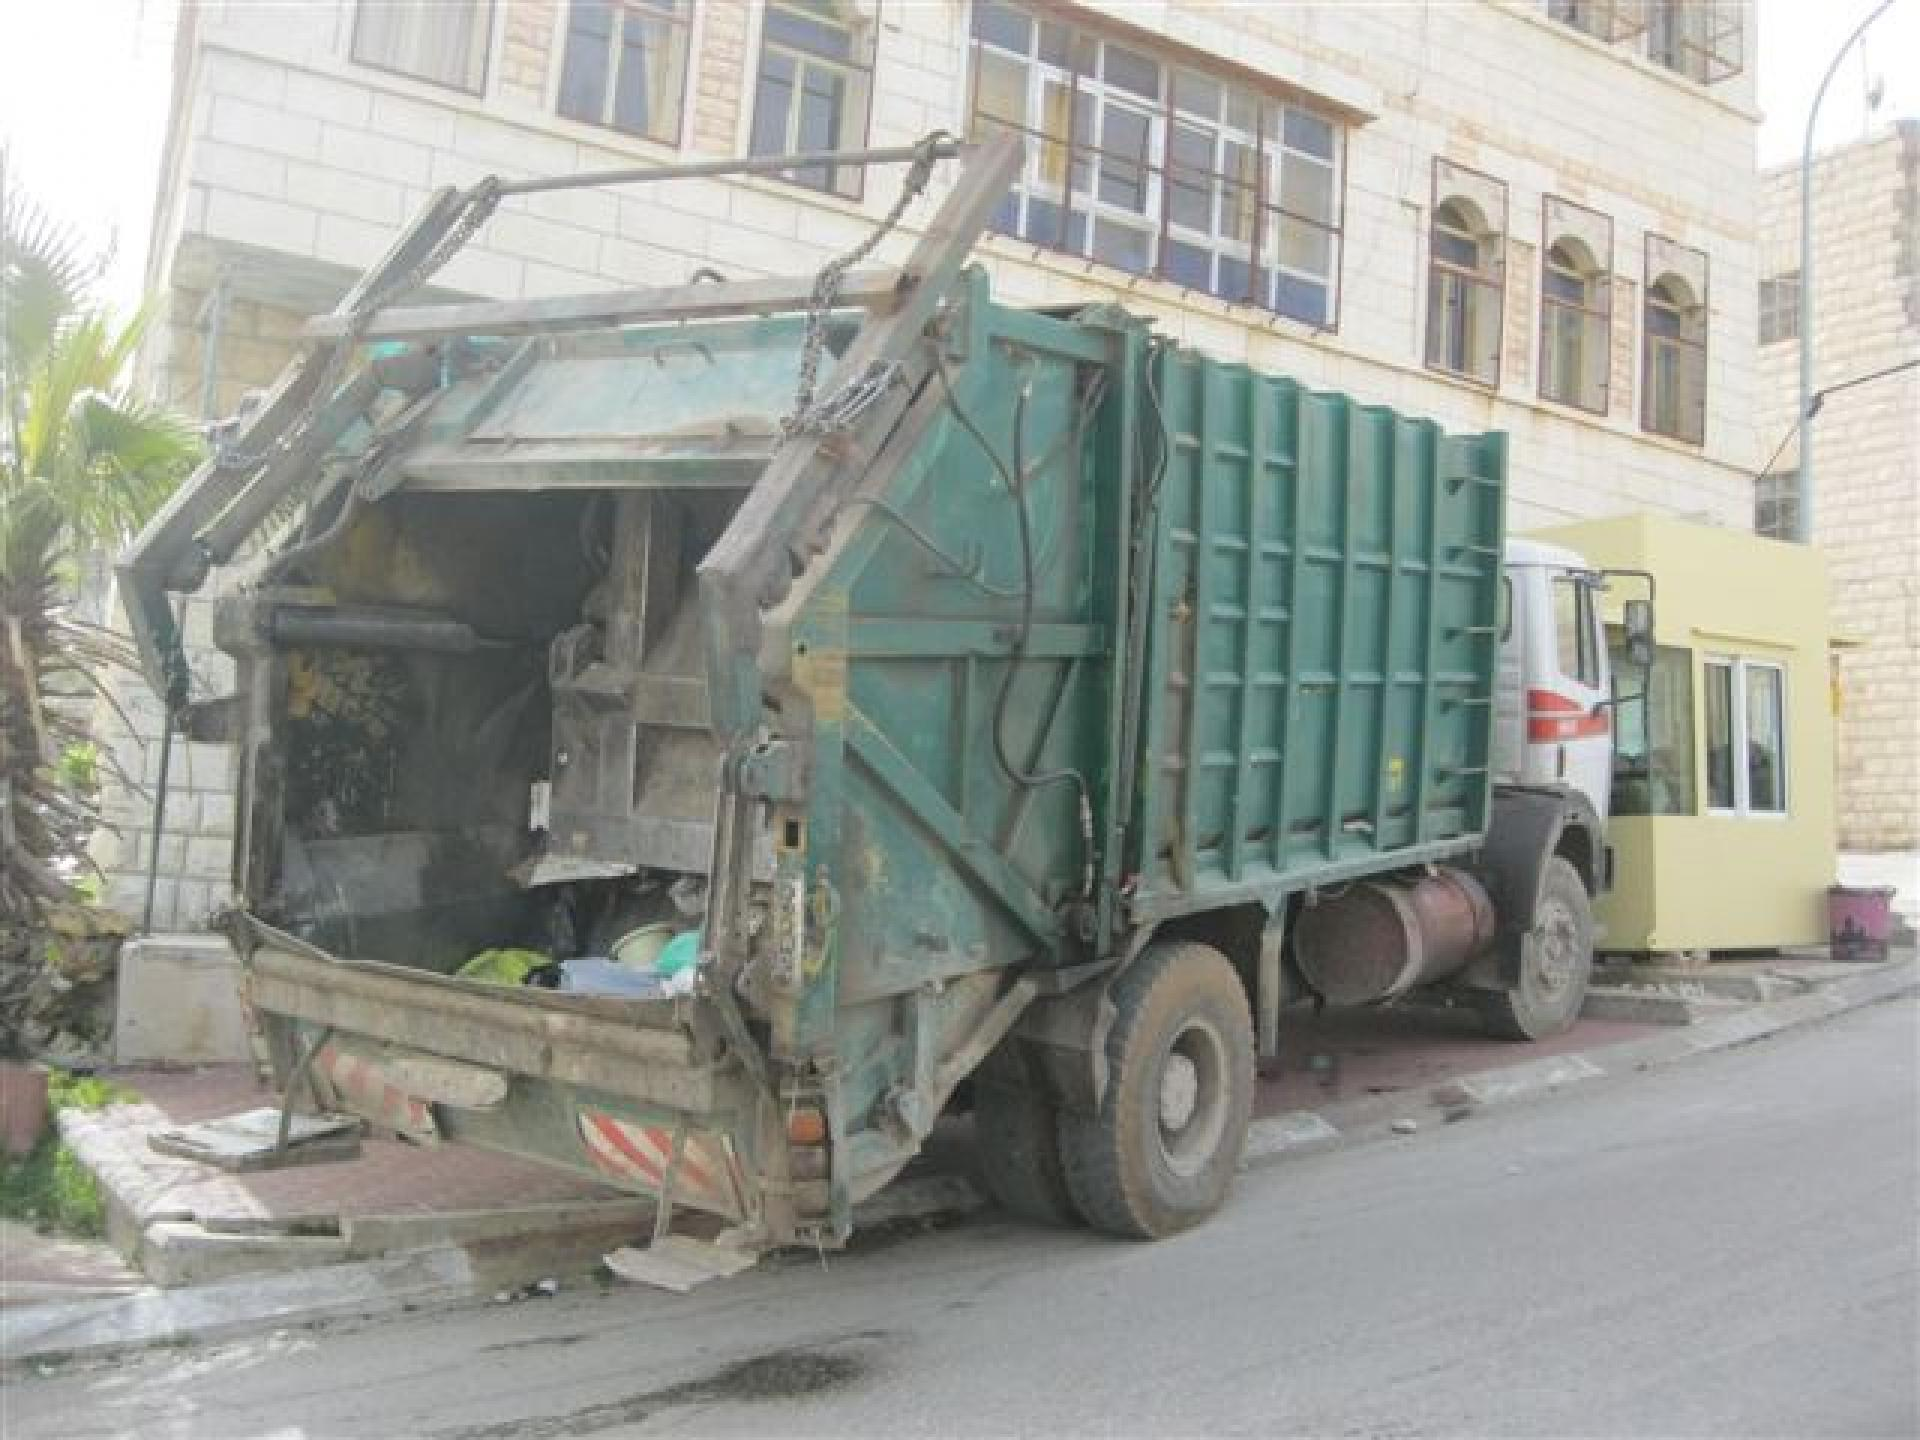 Tel Rumeida checkpoint, Hebron 20.03.12